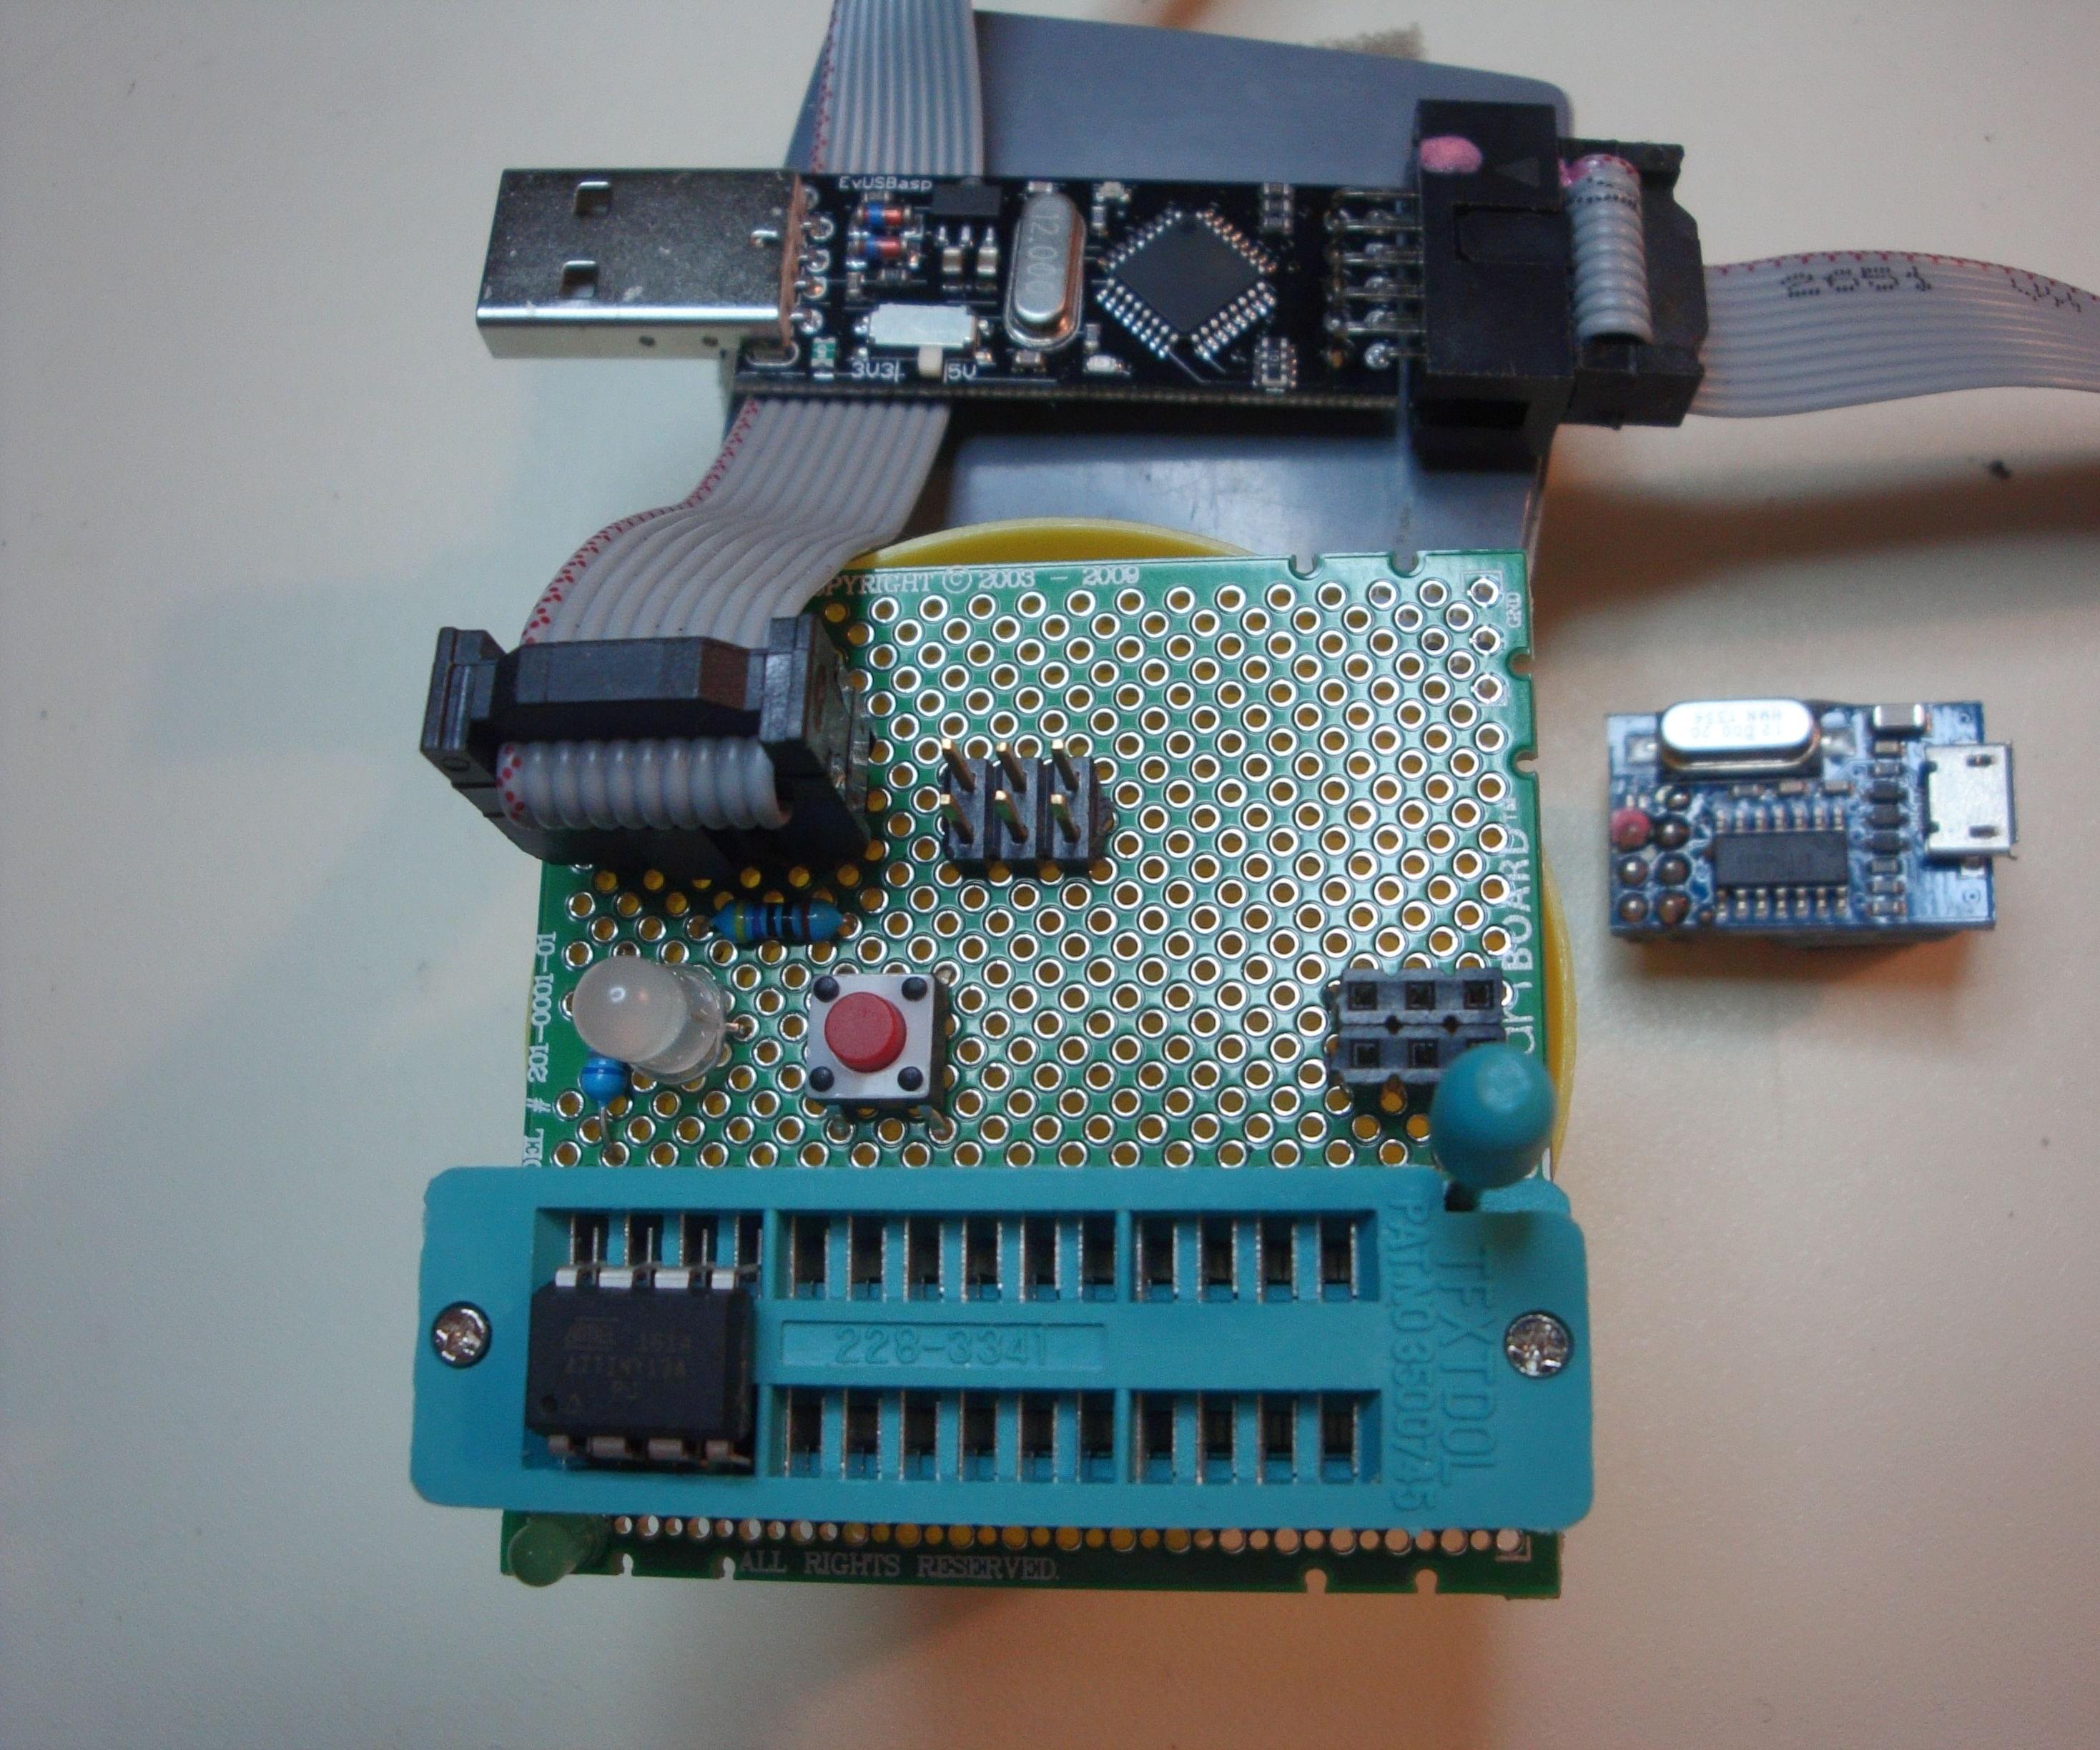 ZIF Jig for AVR ATtiny chip programming